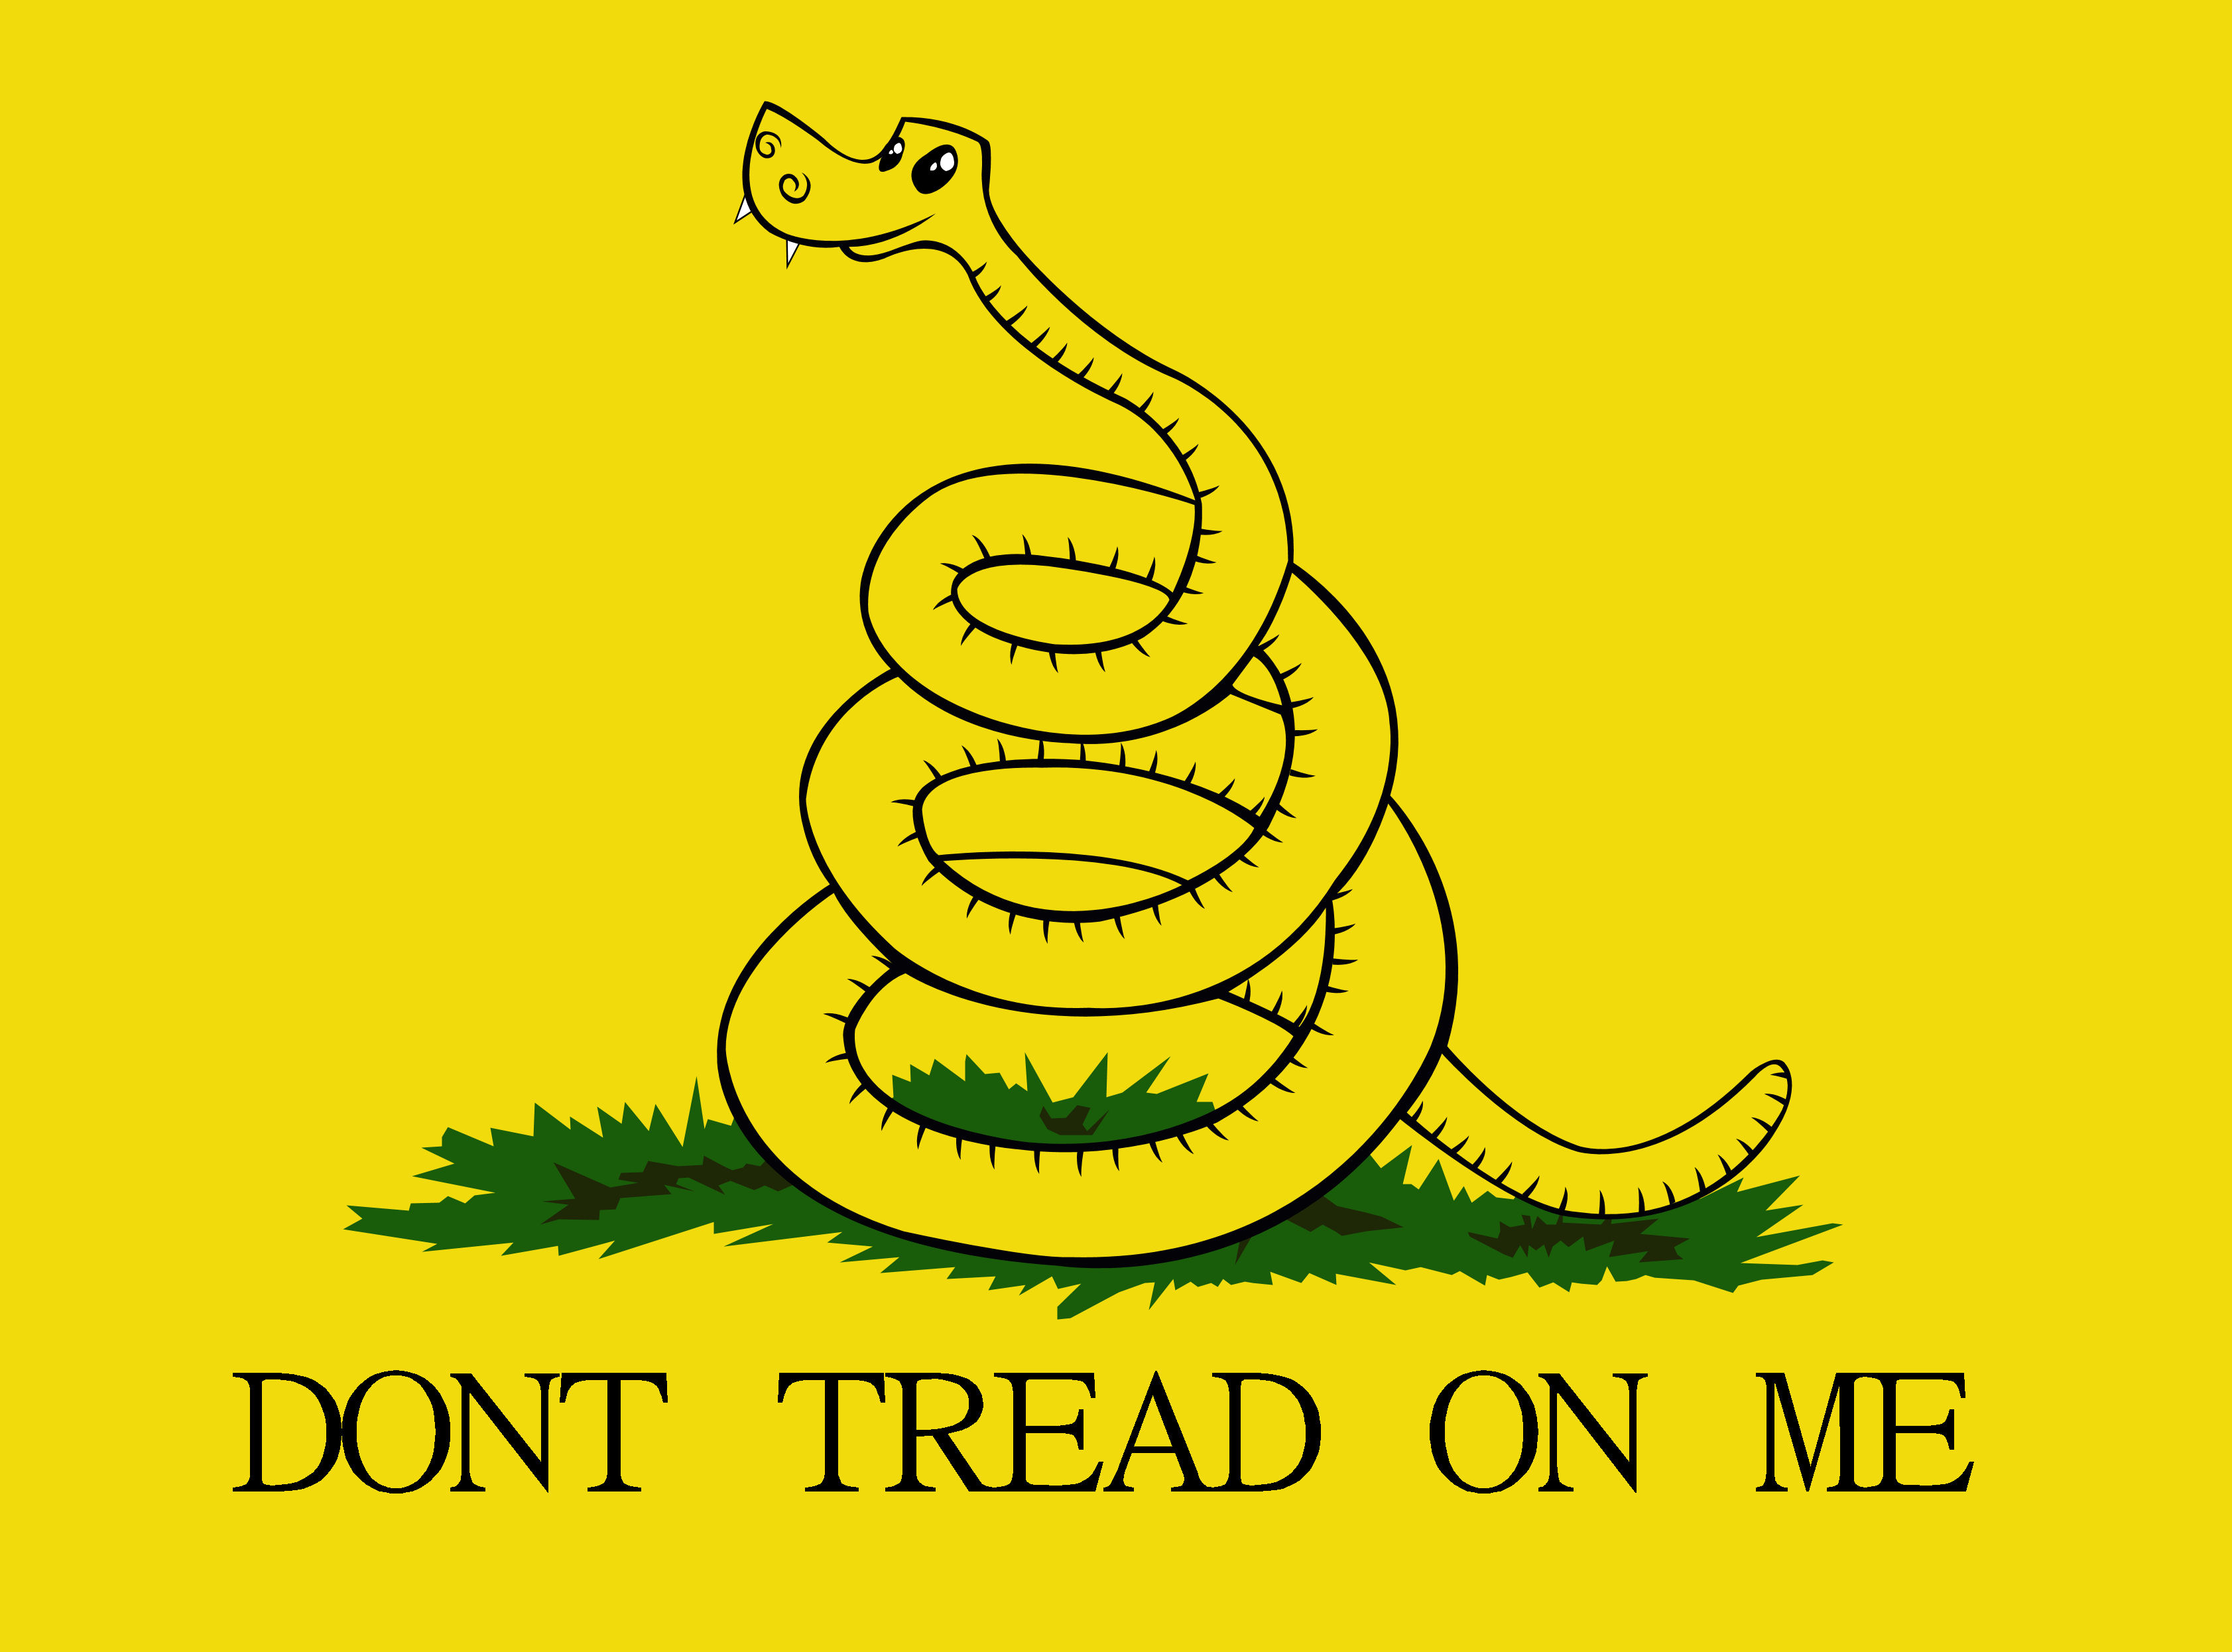 Don't tread on me Flag by GennadyKalugina on DeviantArt